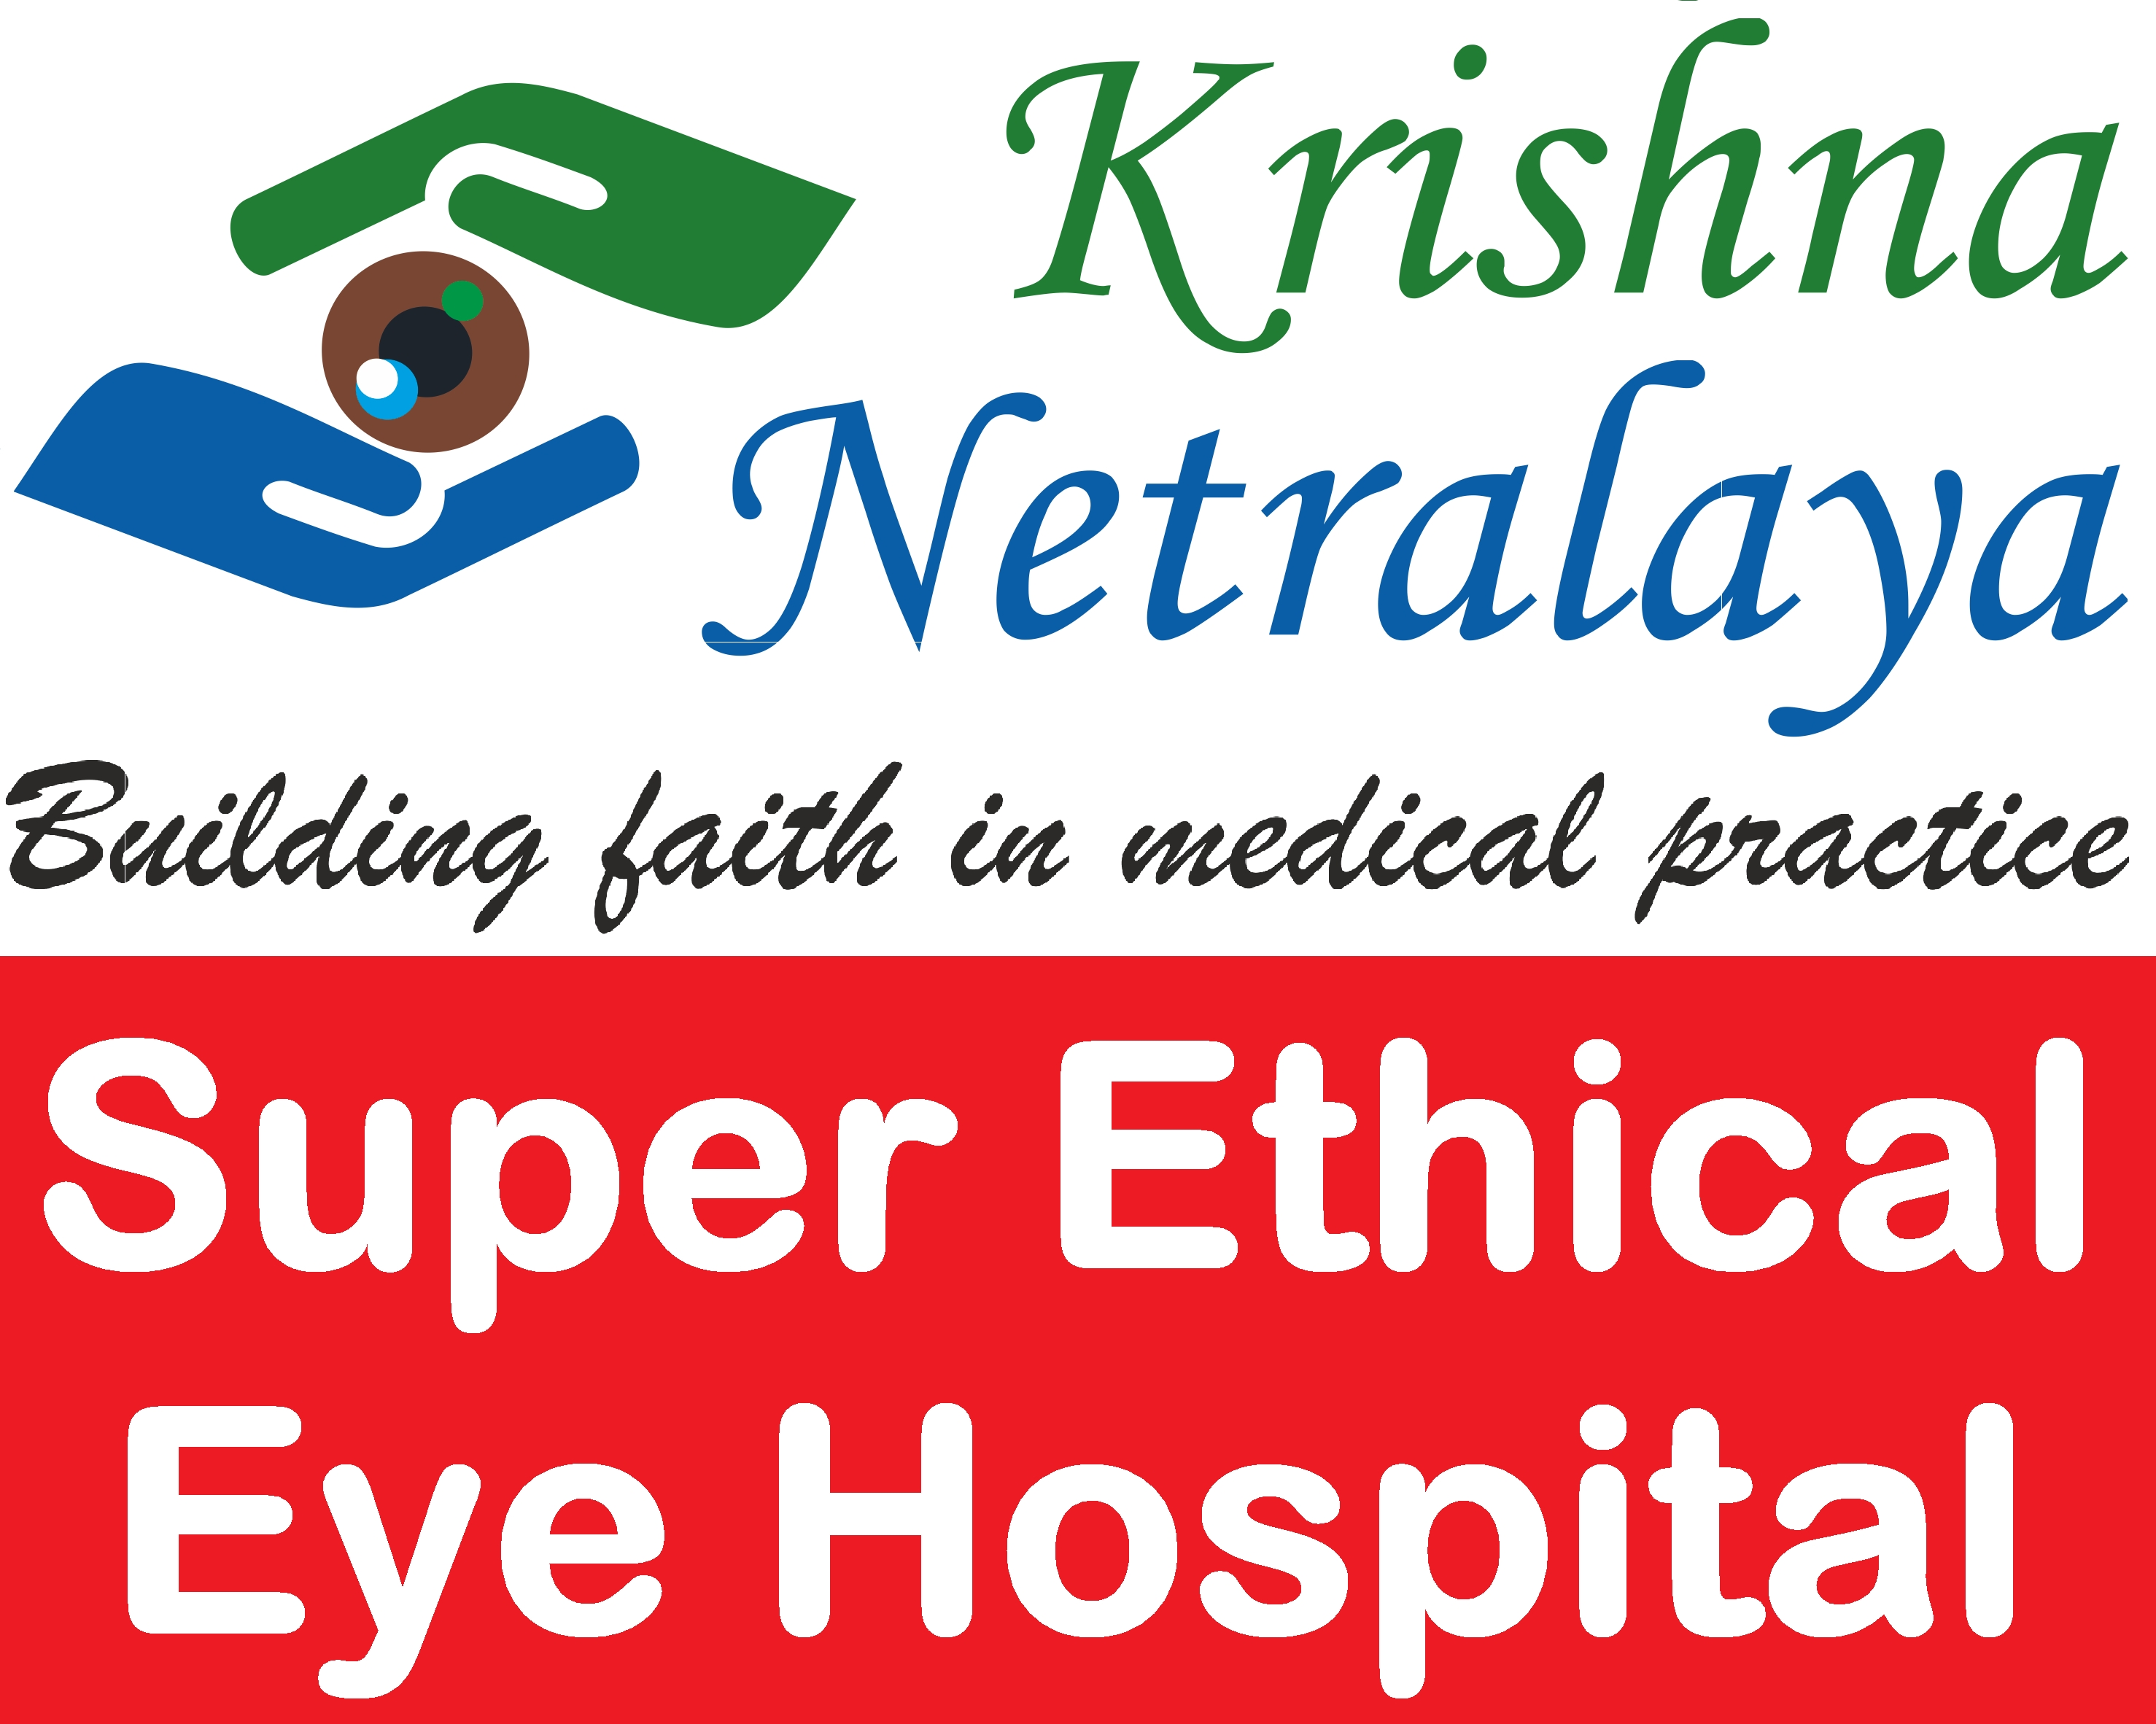 Krishna Netralaya